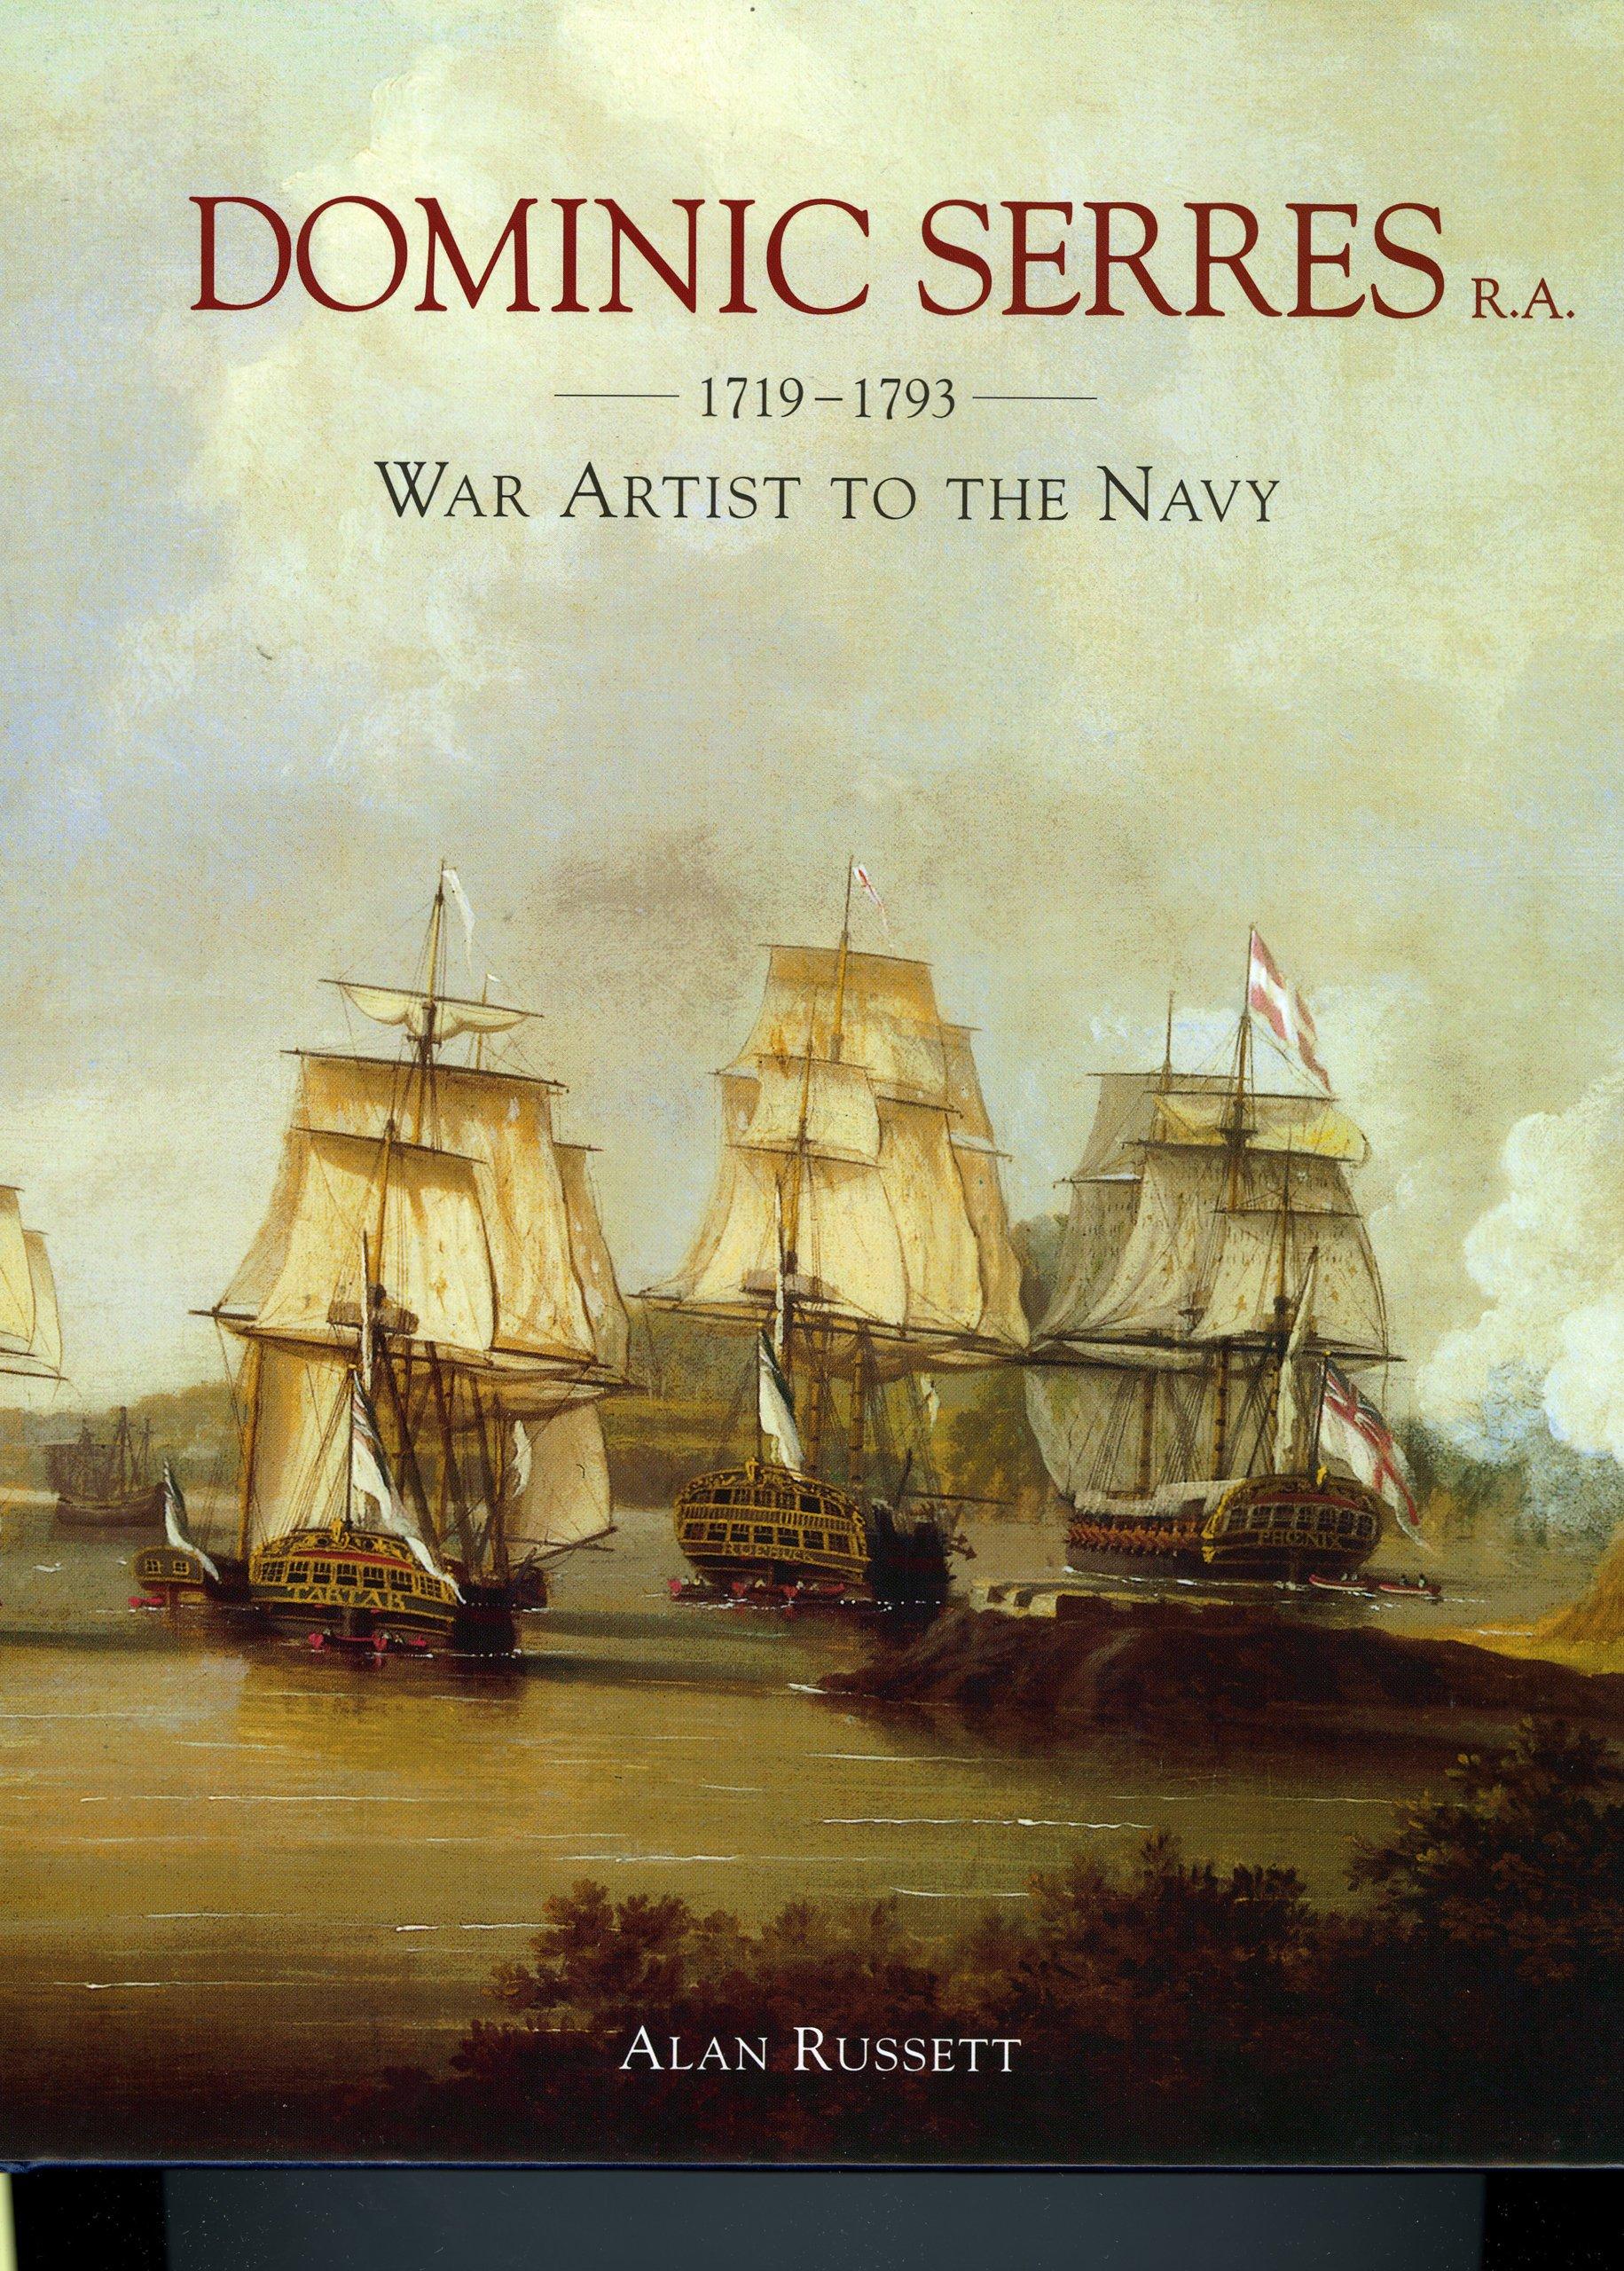 Download Dominic Serres R.A. 1719-1793: War Artist ot the Navy PDF